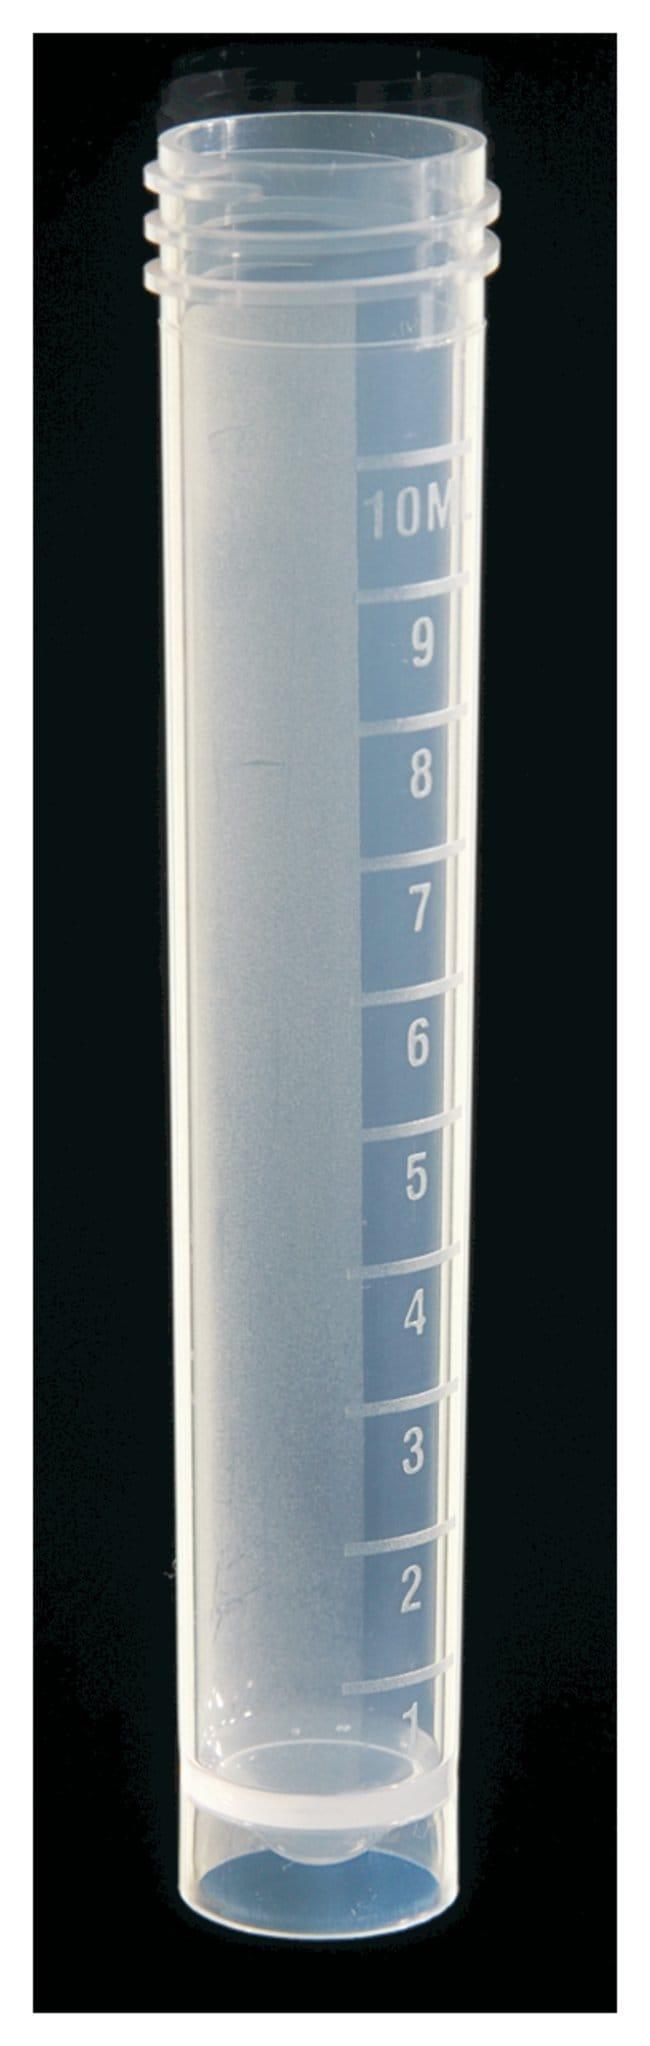 Axygen™Tubos de transporte con tapón de rosca Axygen™ 10mL transport tube; With attached cap; Presterilized Axygen™Tubos de transporte con tapón de rosca Axygen™